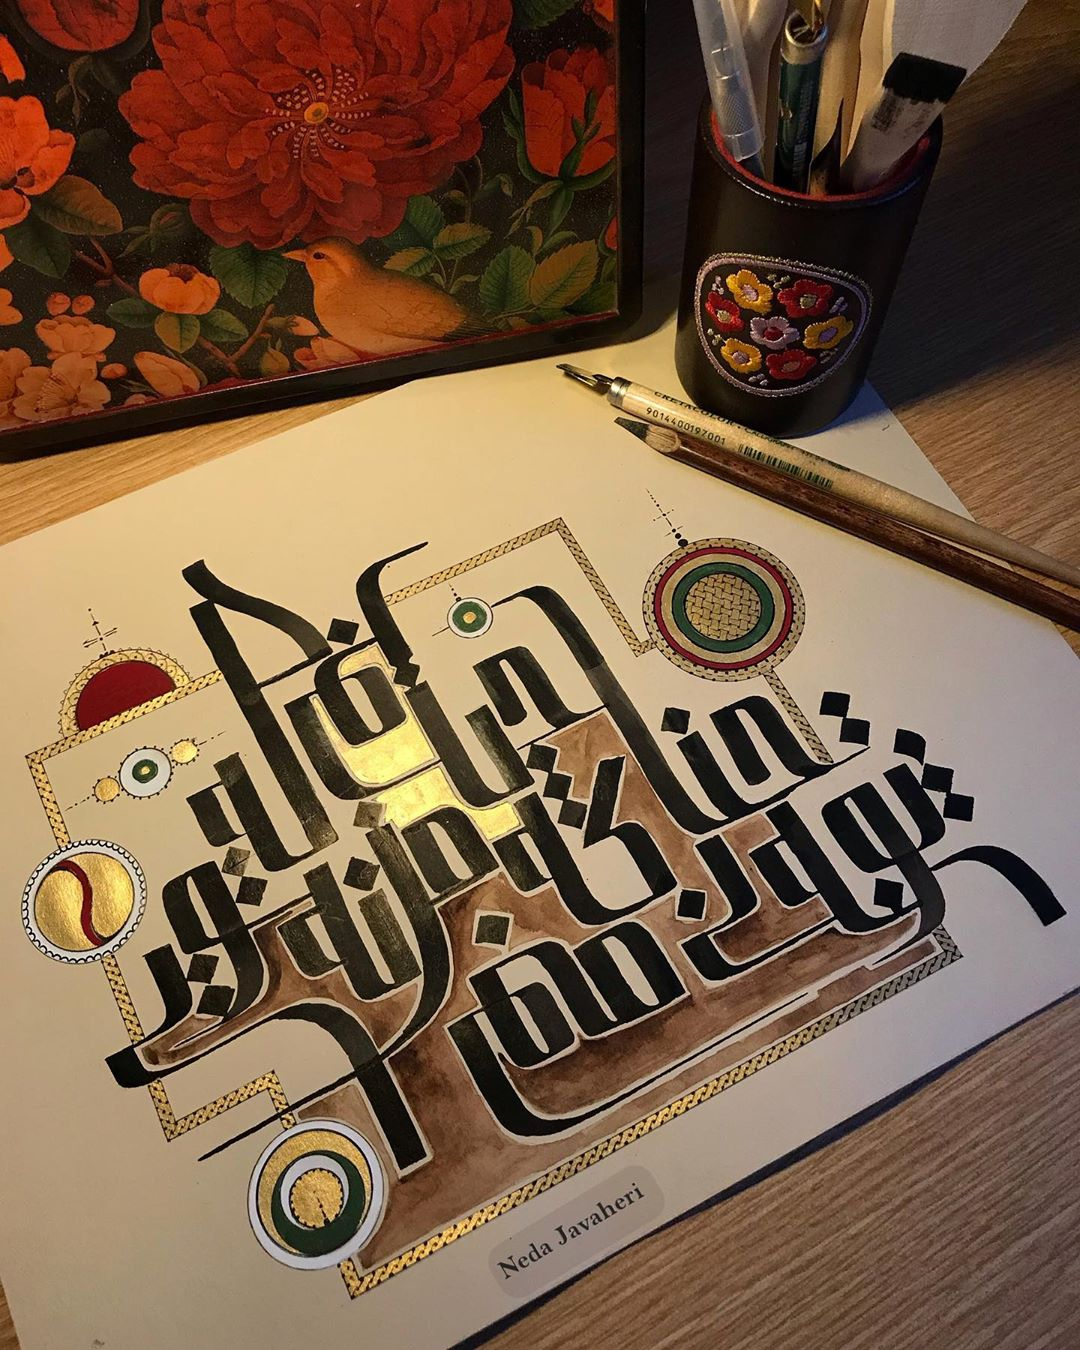 Karya Kaligrafi  تو نه چنانی که منم من نه چنانم که تویی تو نه بر آنی که منم من نه بر آنم که تویی…- Ne Javaher